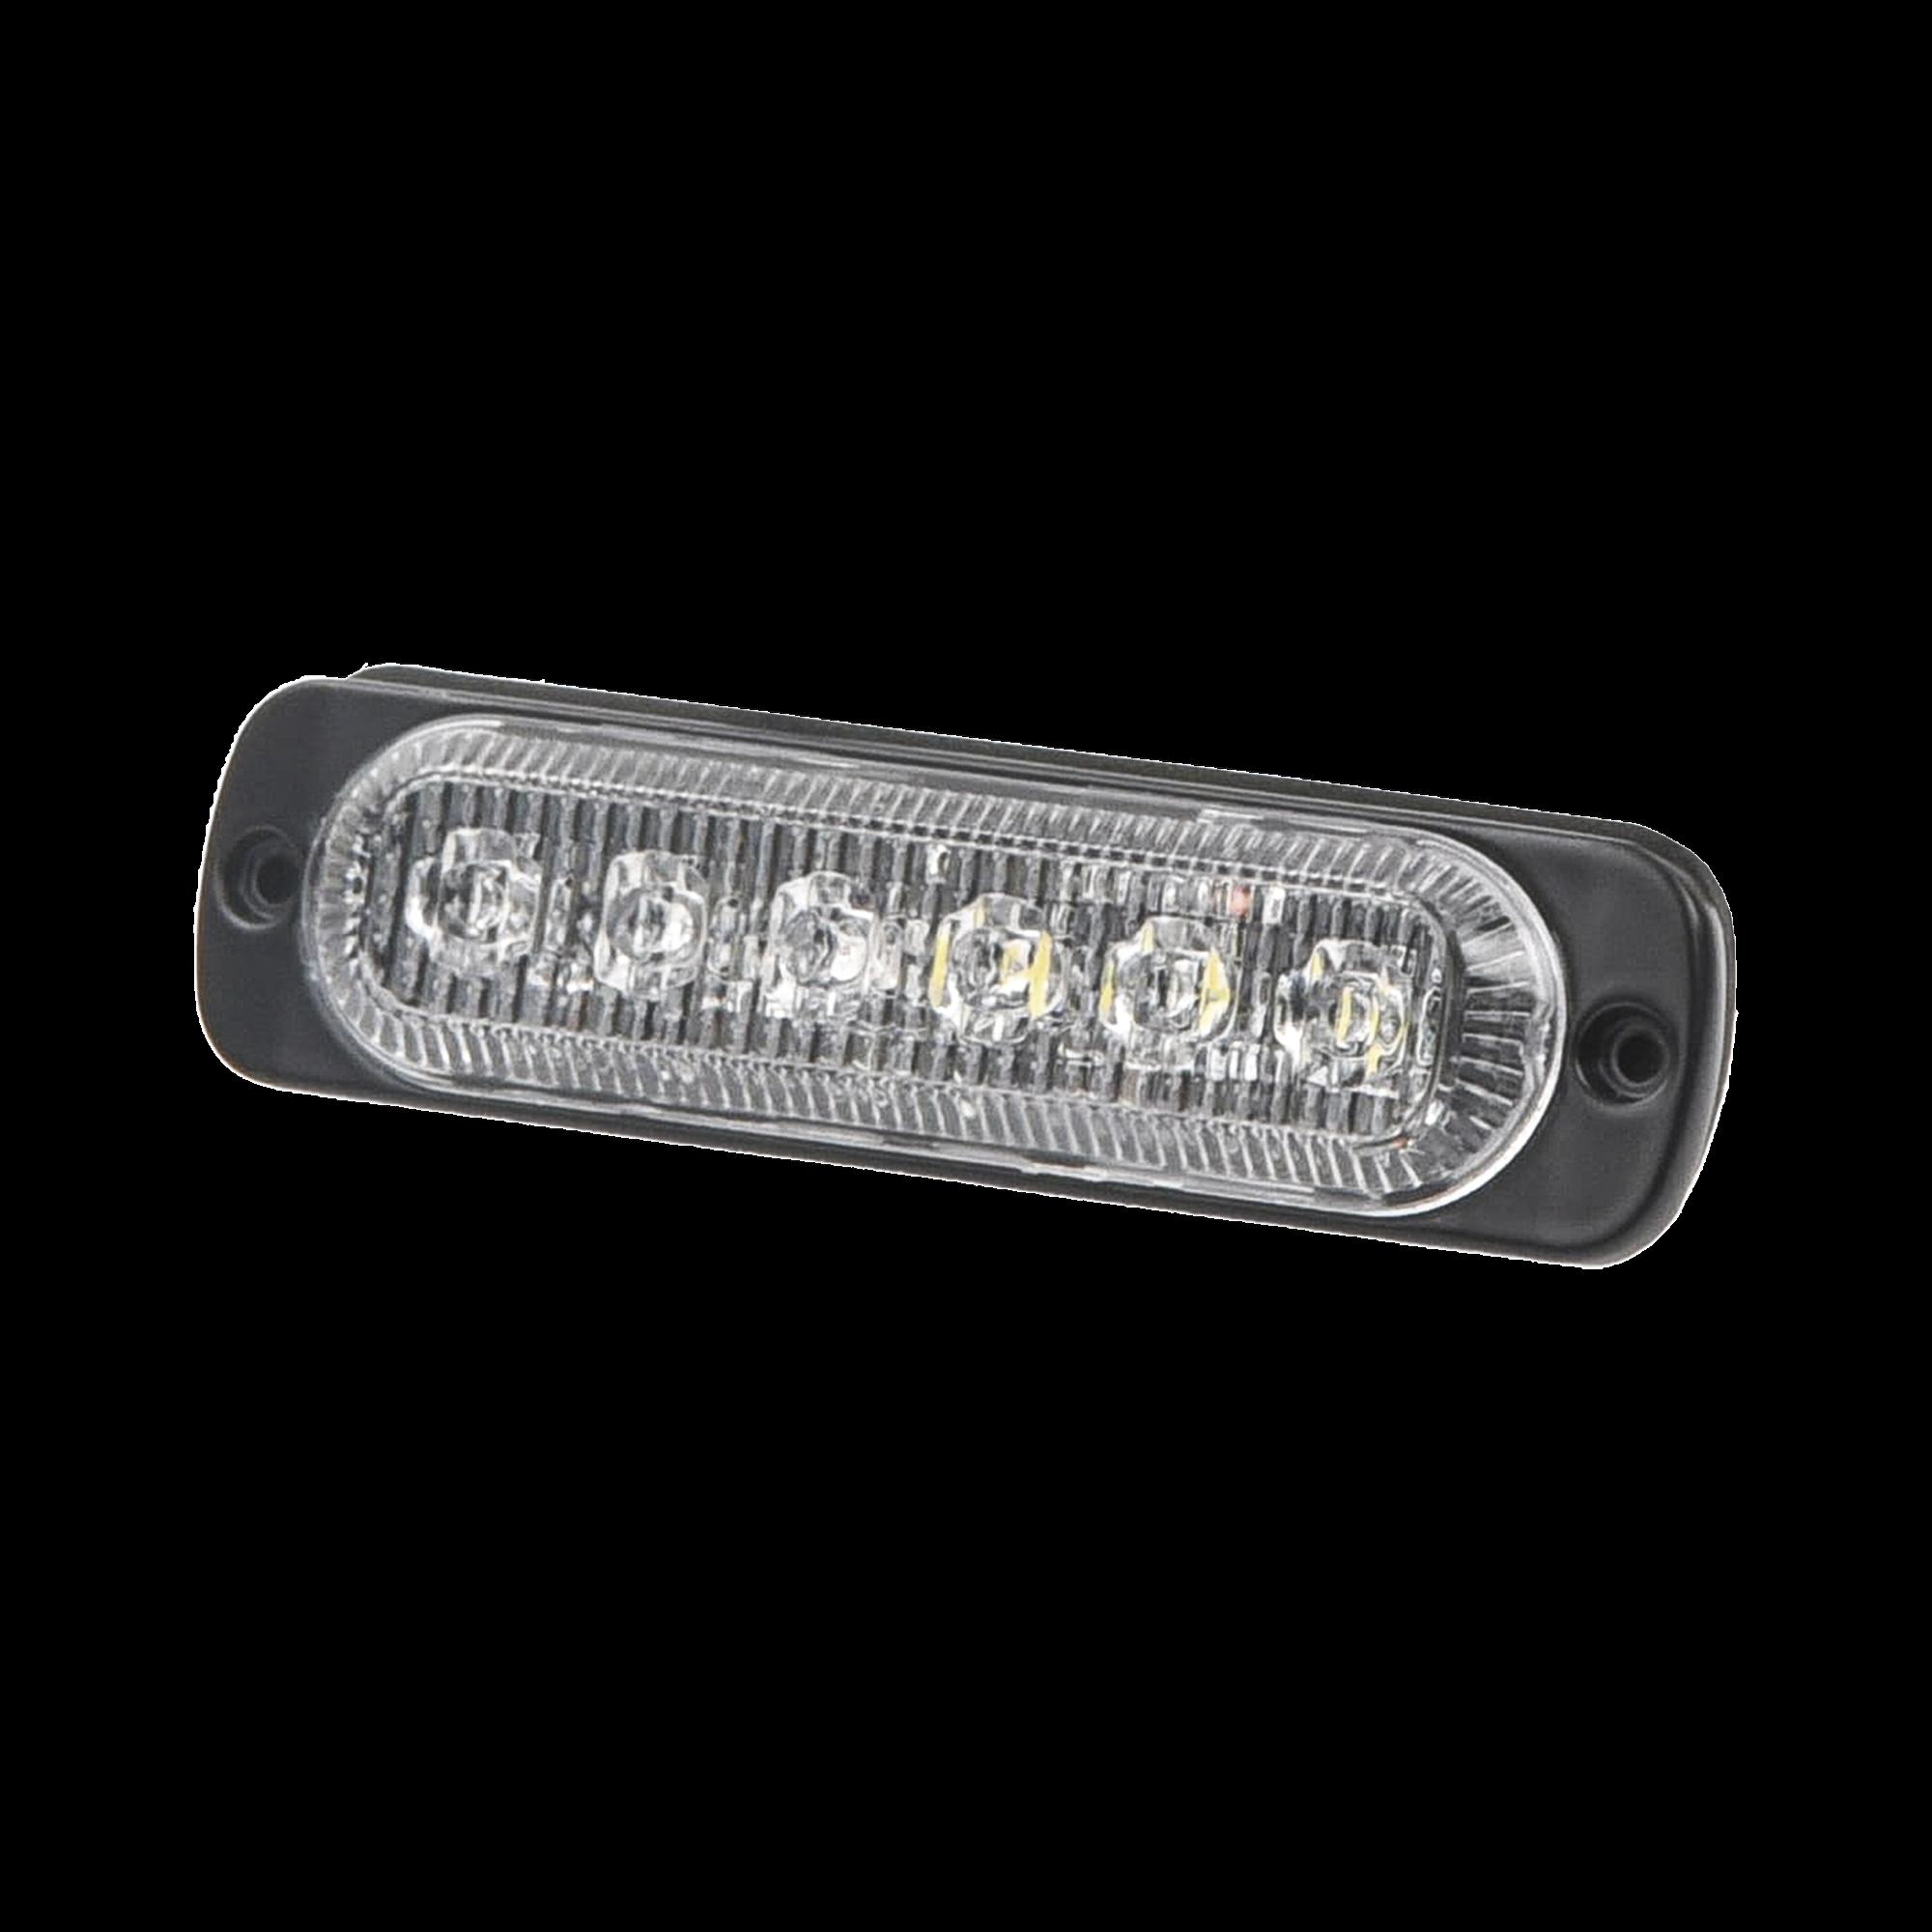 Luz direccional con 6 LEDS, color ambar/claro, 12-24 VCD